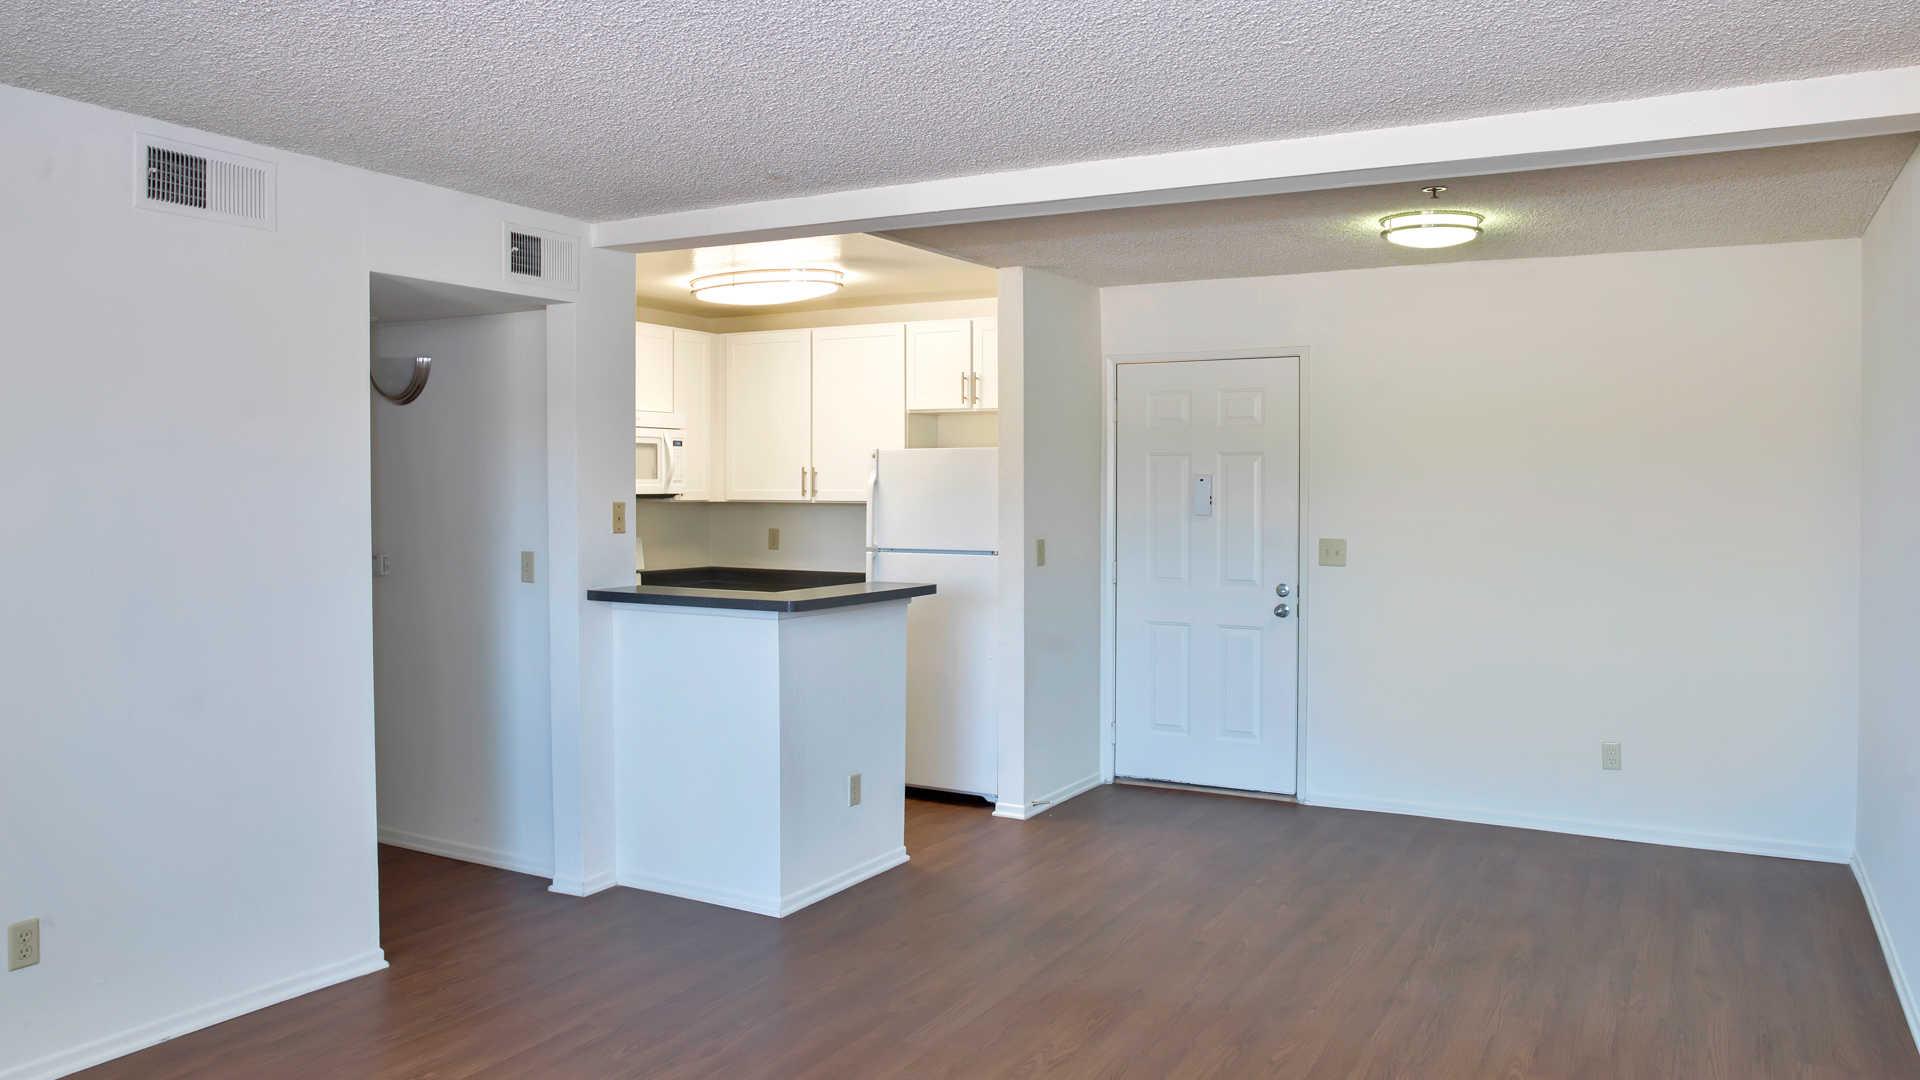 Park West Apartments Reviews In Westchester 9400 La Tijera Blvd Equityapartments